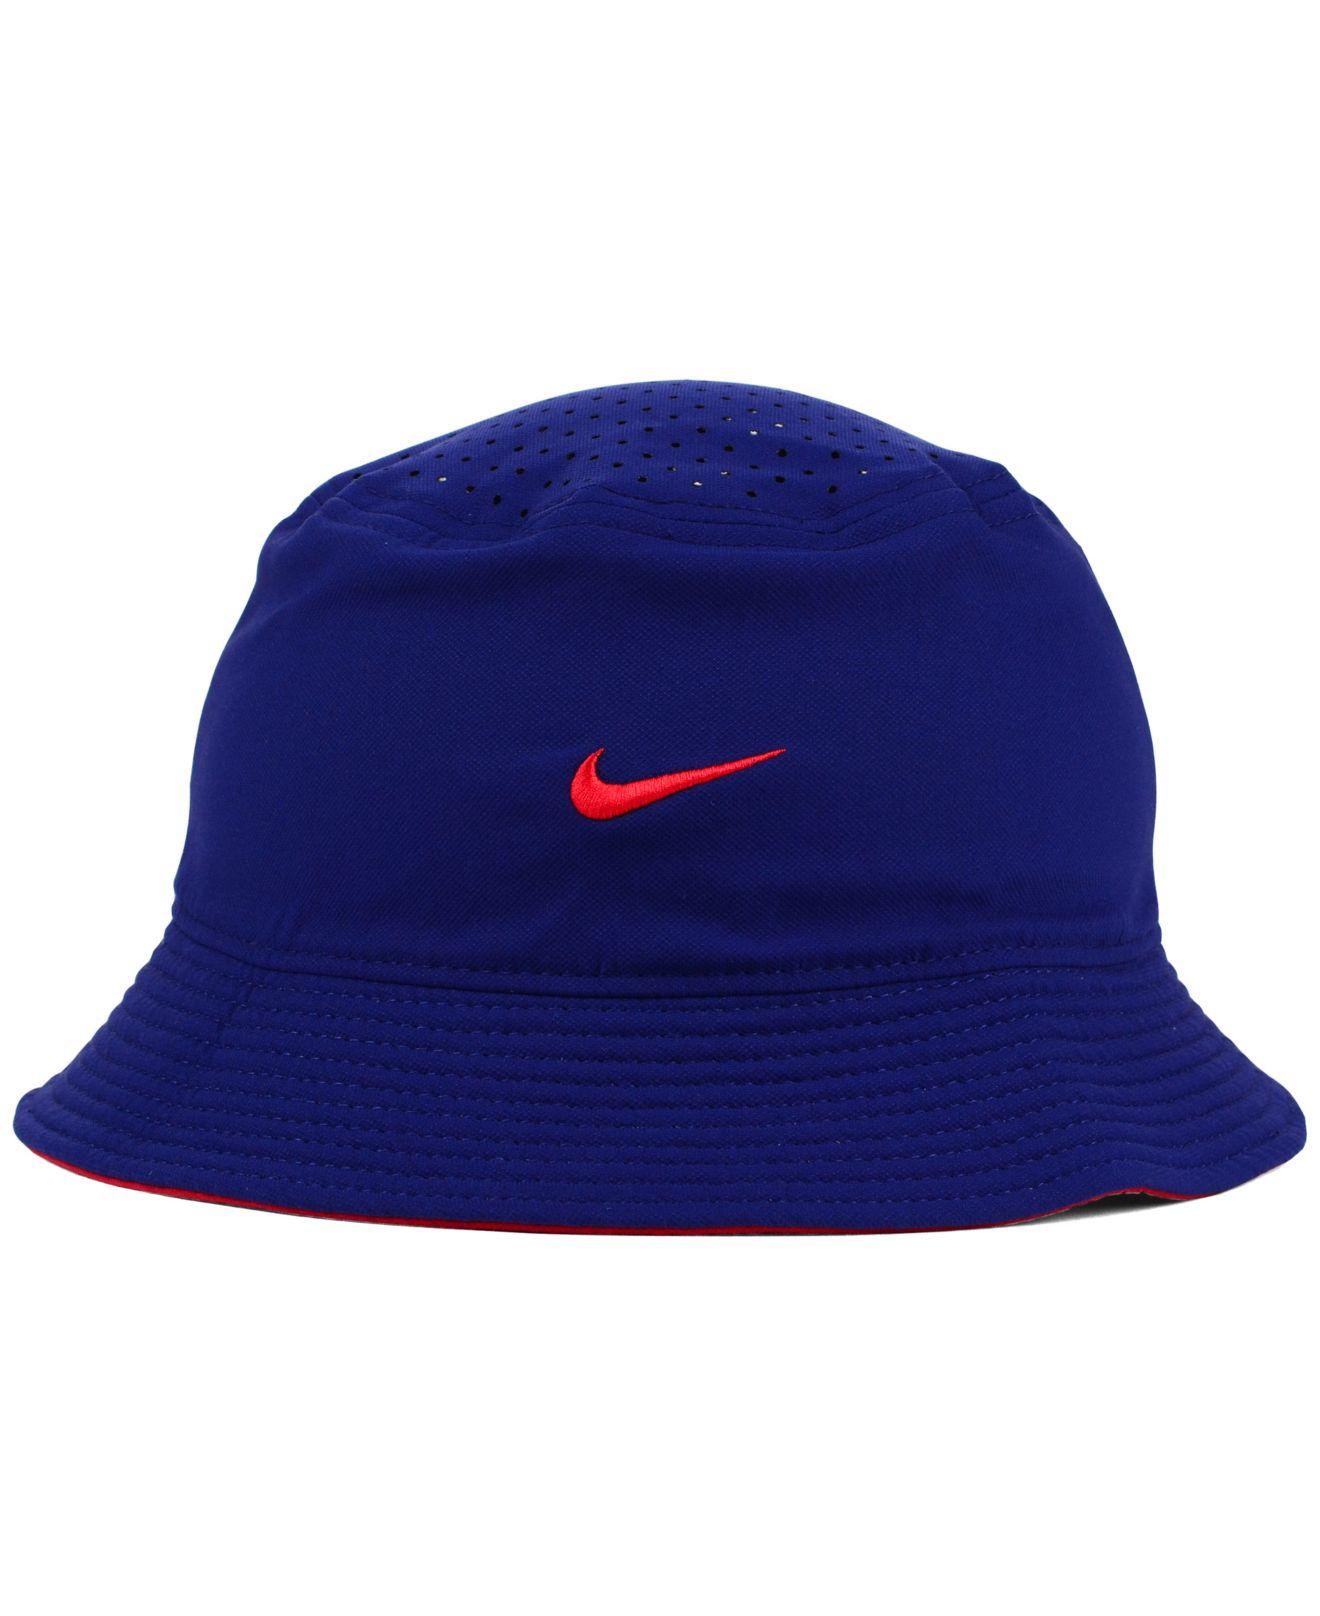 7c4efcfa62c Lyst - Nike Chicago Cubs Vapor Dri-Fit Bucket Hat in Blue for Men